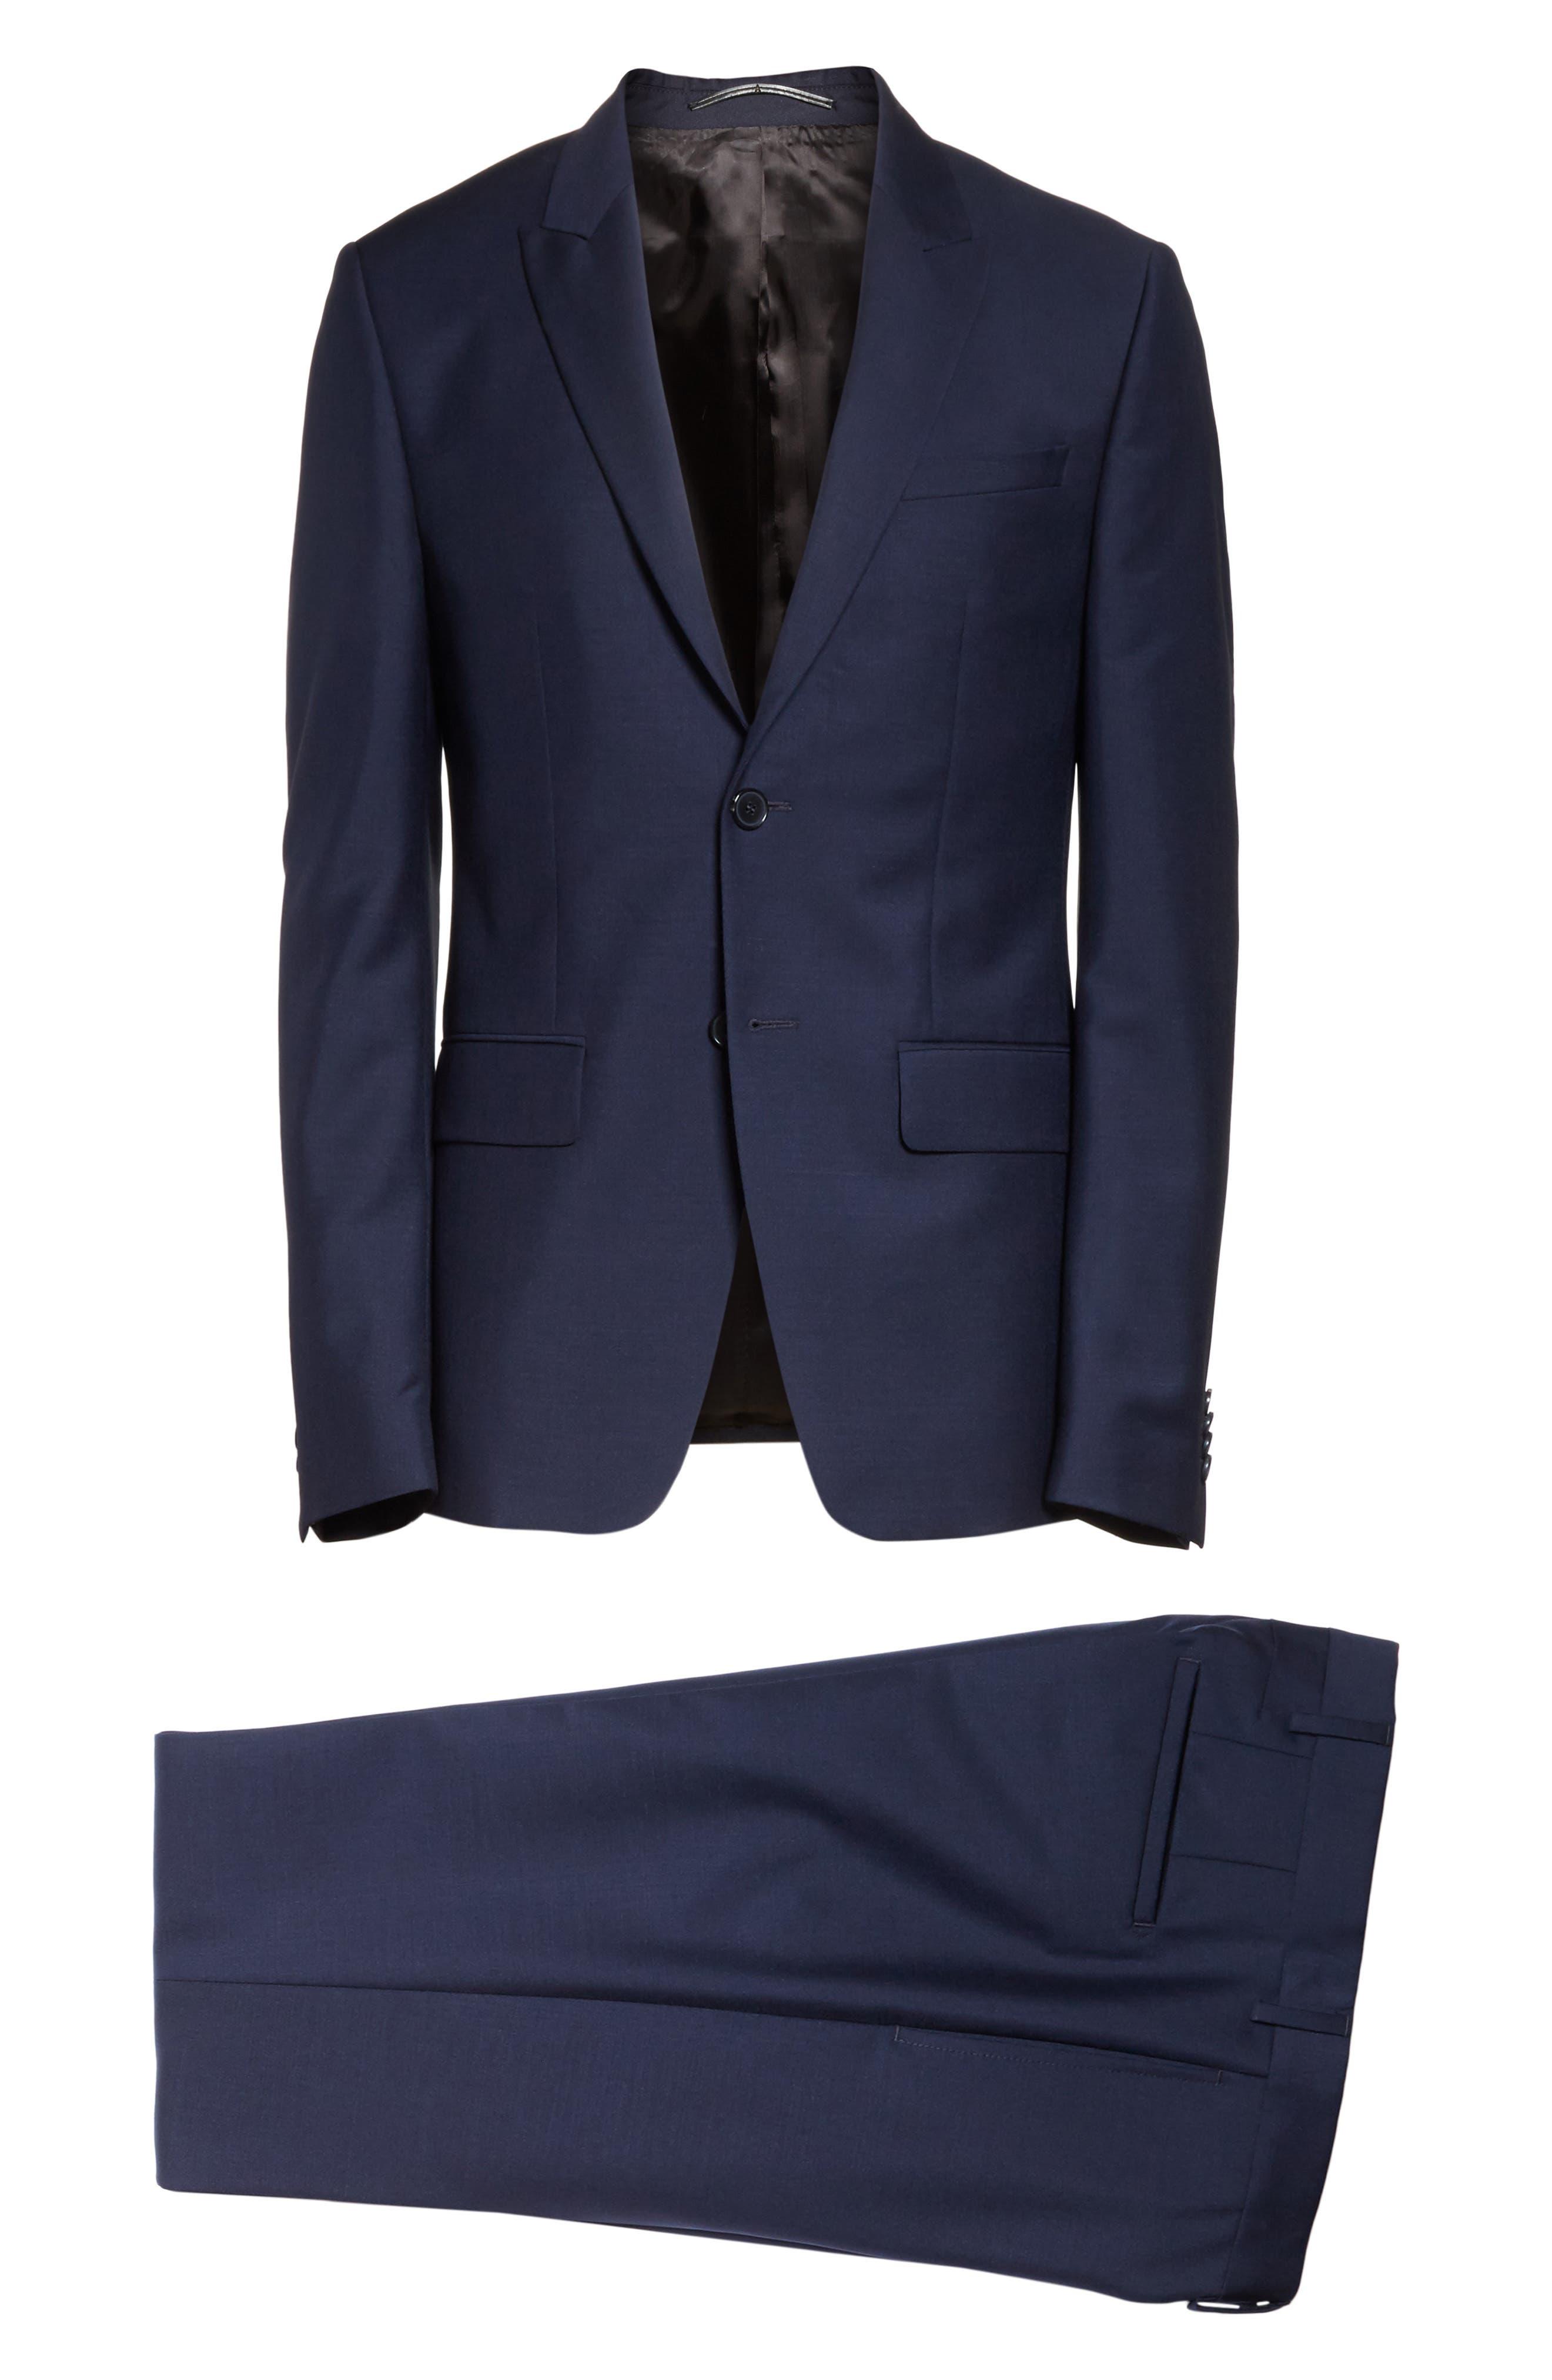 Wool & Mohair Suit,                             Alternate thumbnail 8, color,                             403